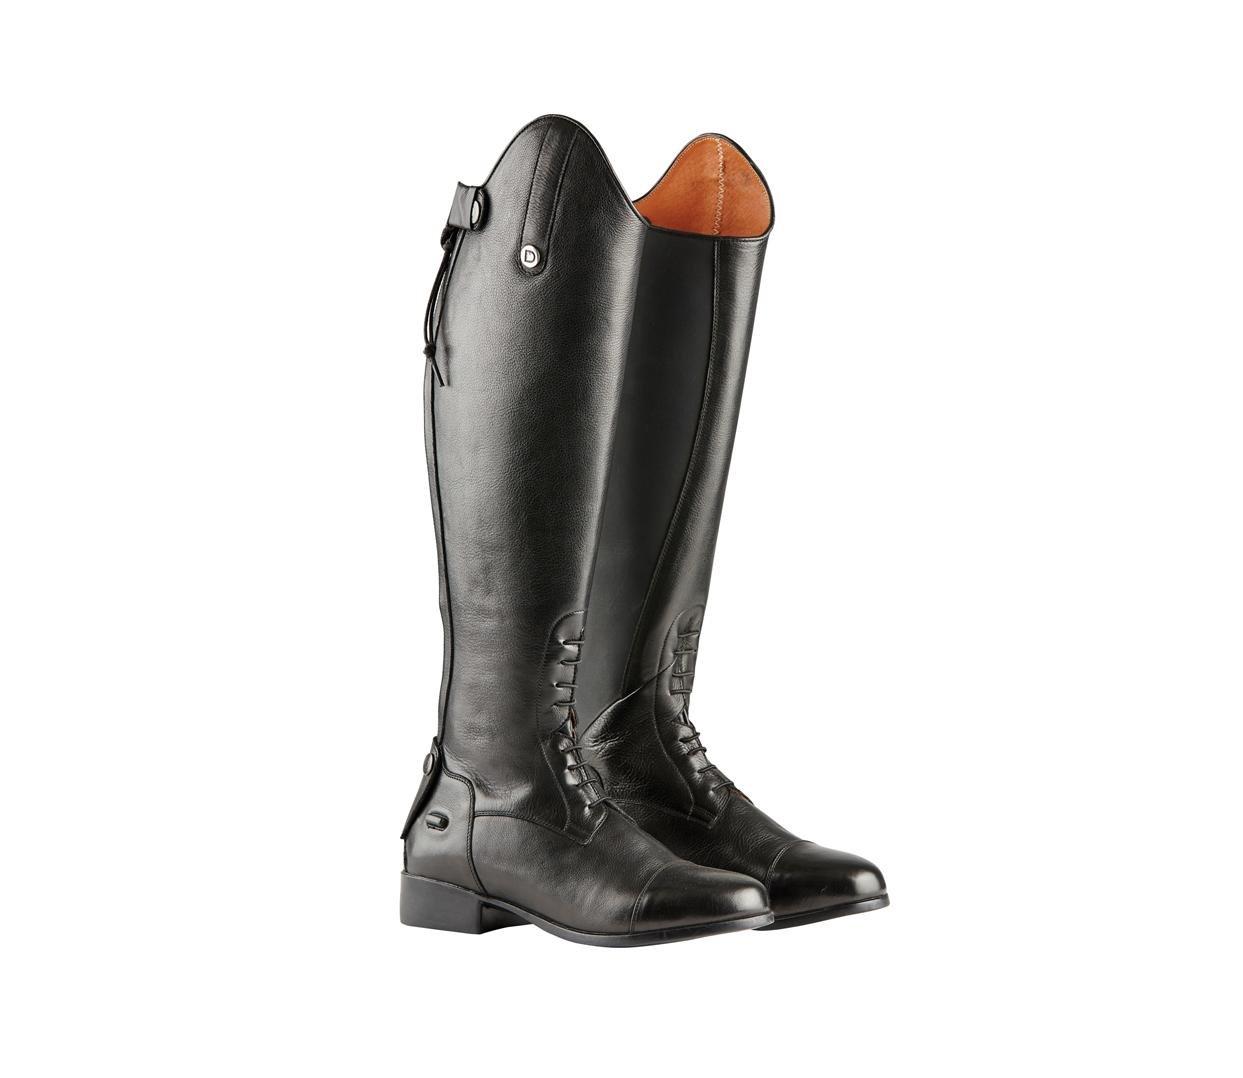 Dublin Holywell Tall Field Boots 8.5 Regular Black